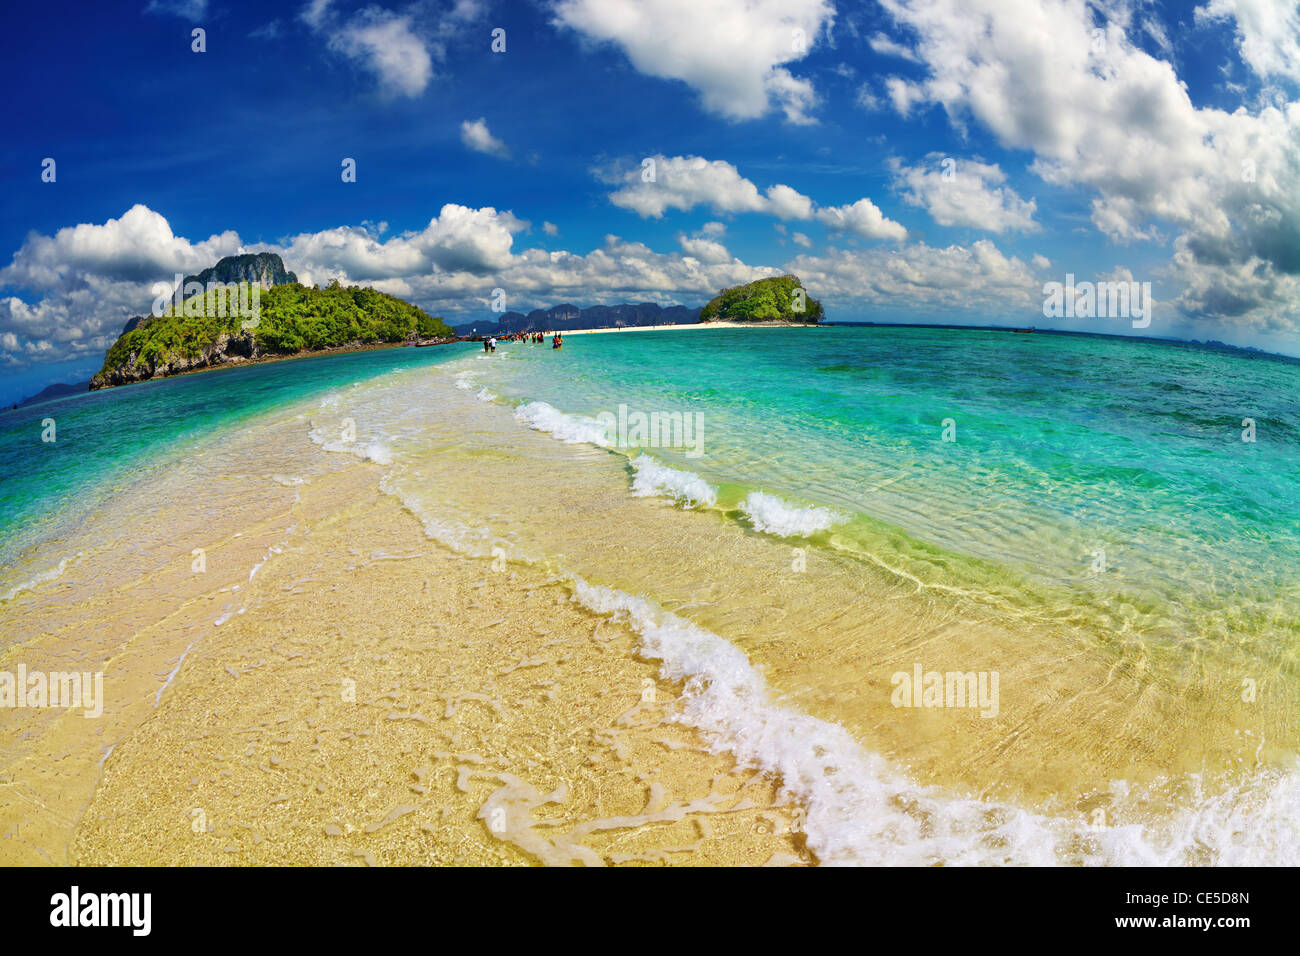 Tropical beach, Andaman Sea, Thailand, fisheye shot - Stock Image